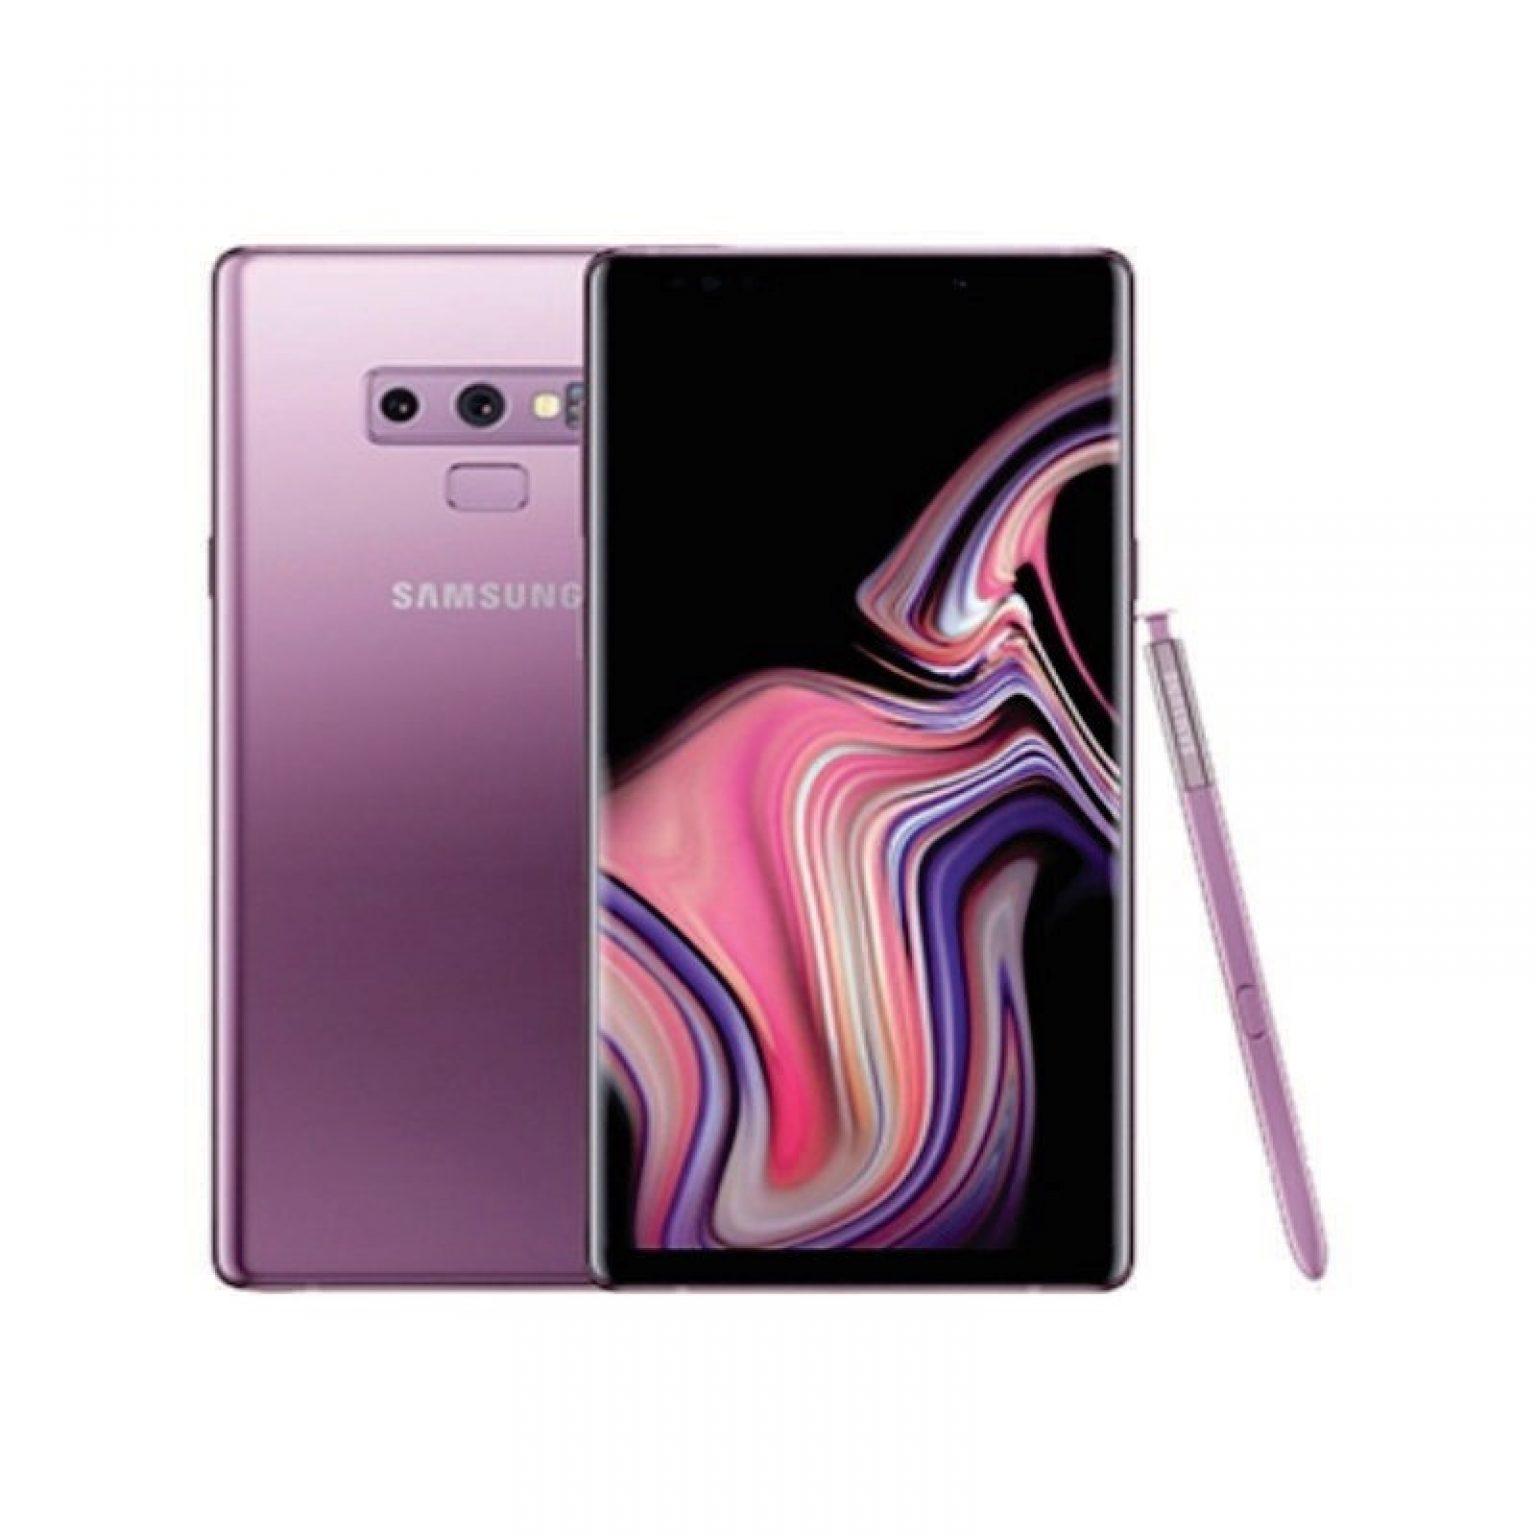 SAMSUNG - Note 9 128 Purple [SM-N960FZPDXID]